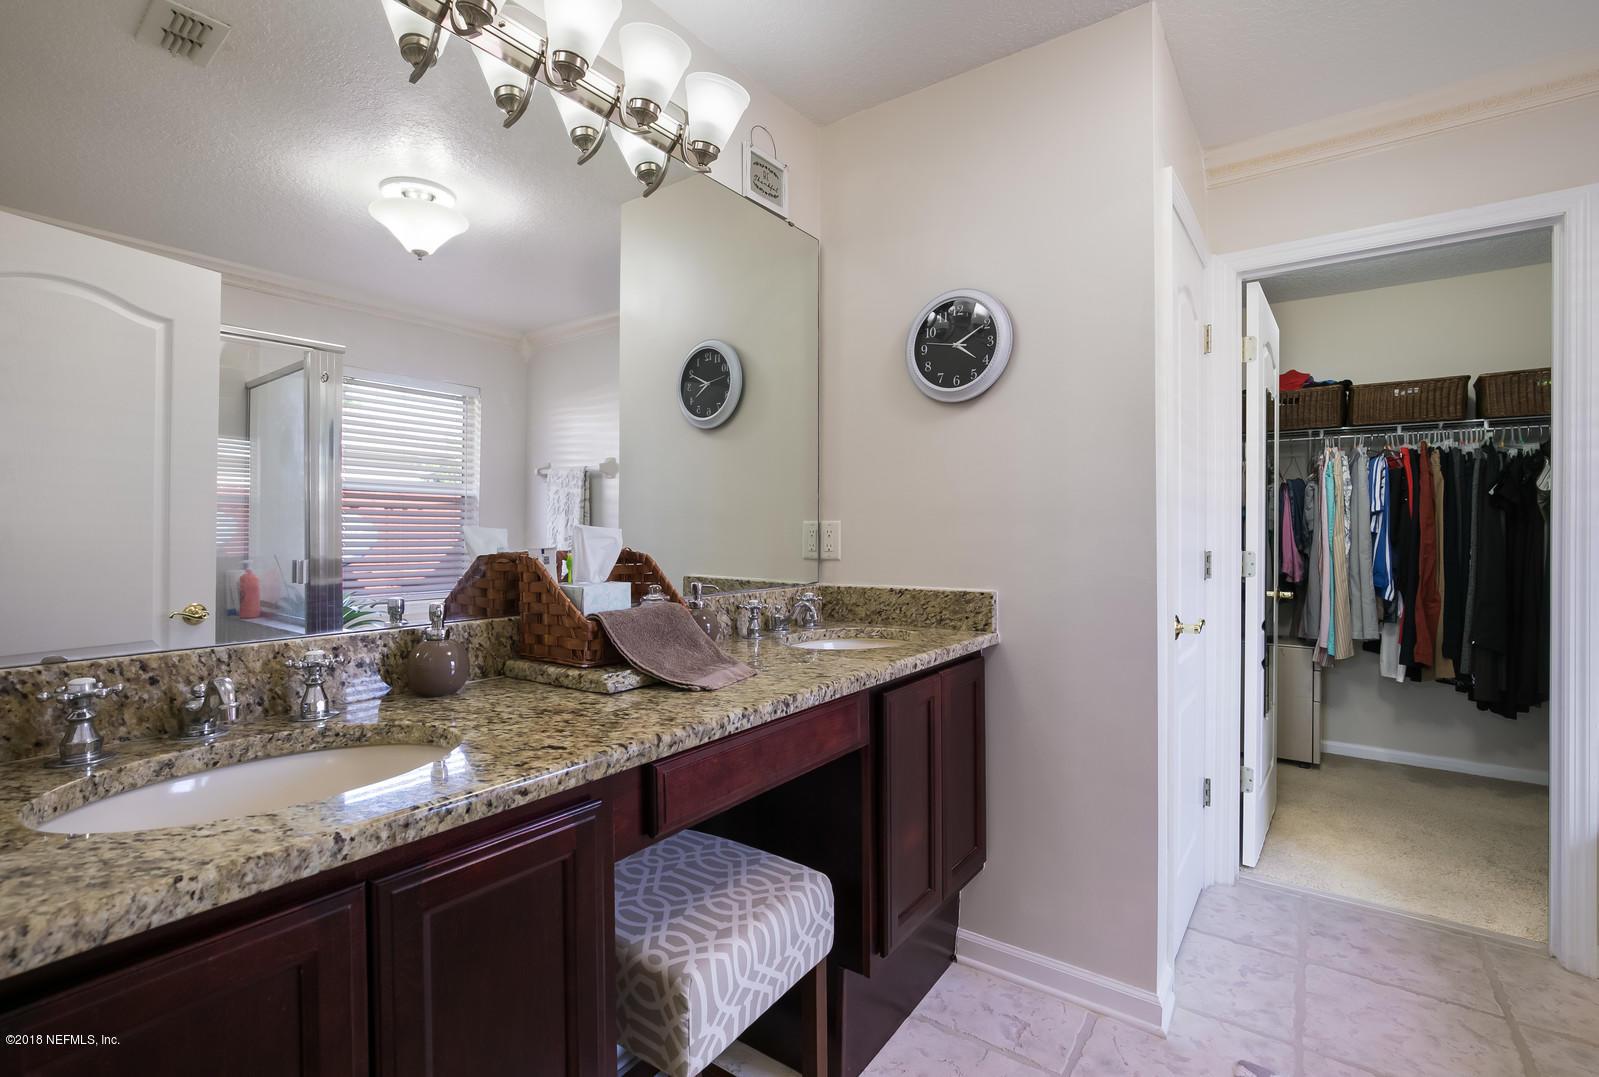 12274 YORK HARBOR, JACKSONVILLE, FLORIDA 32225, 4 Bedrooms Bedrooms, ,2 BathroomsBathrooms,Residential - single family,For sale,YORK HARBOR,961908